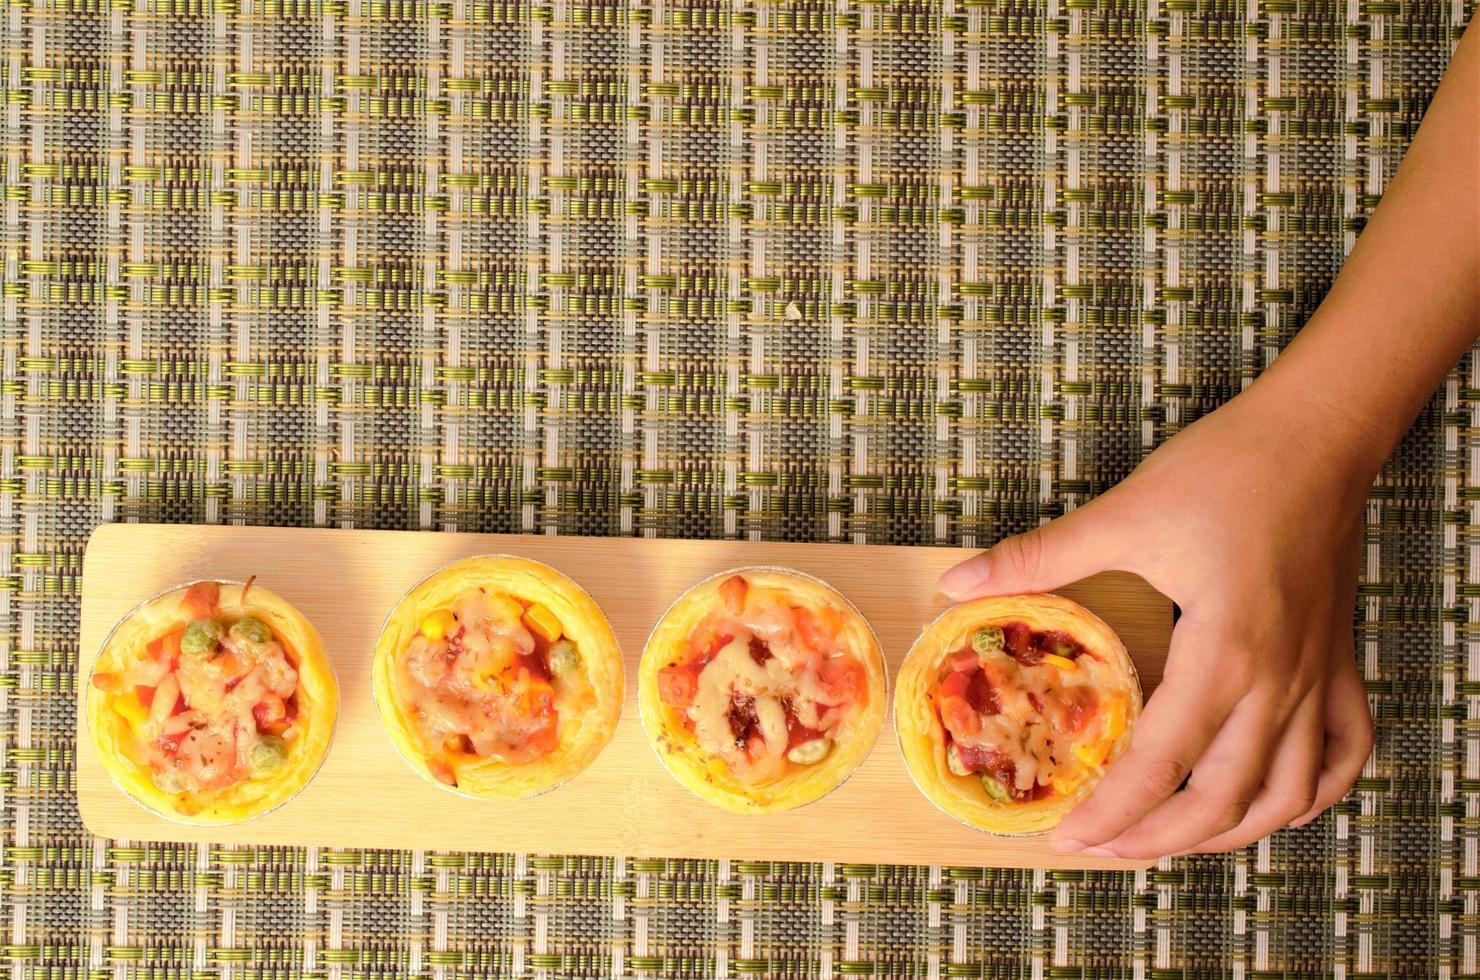 Kids hand touching homemade egg tart pizza backgrounds above photo